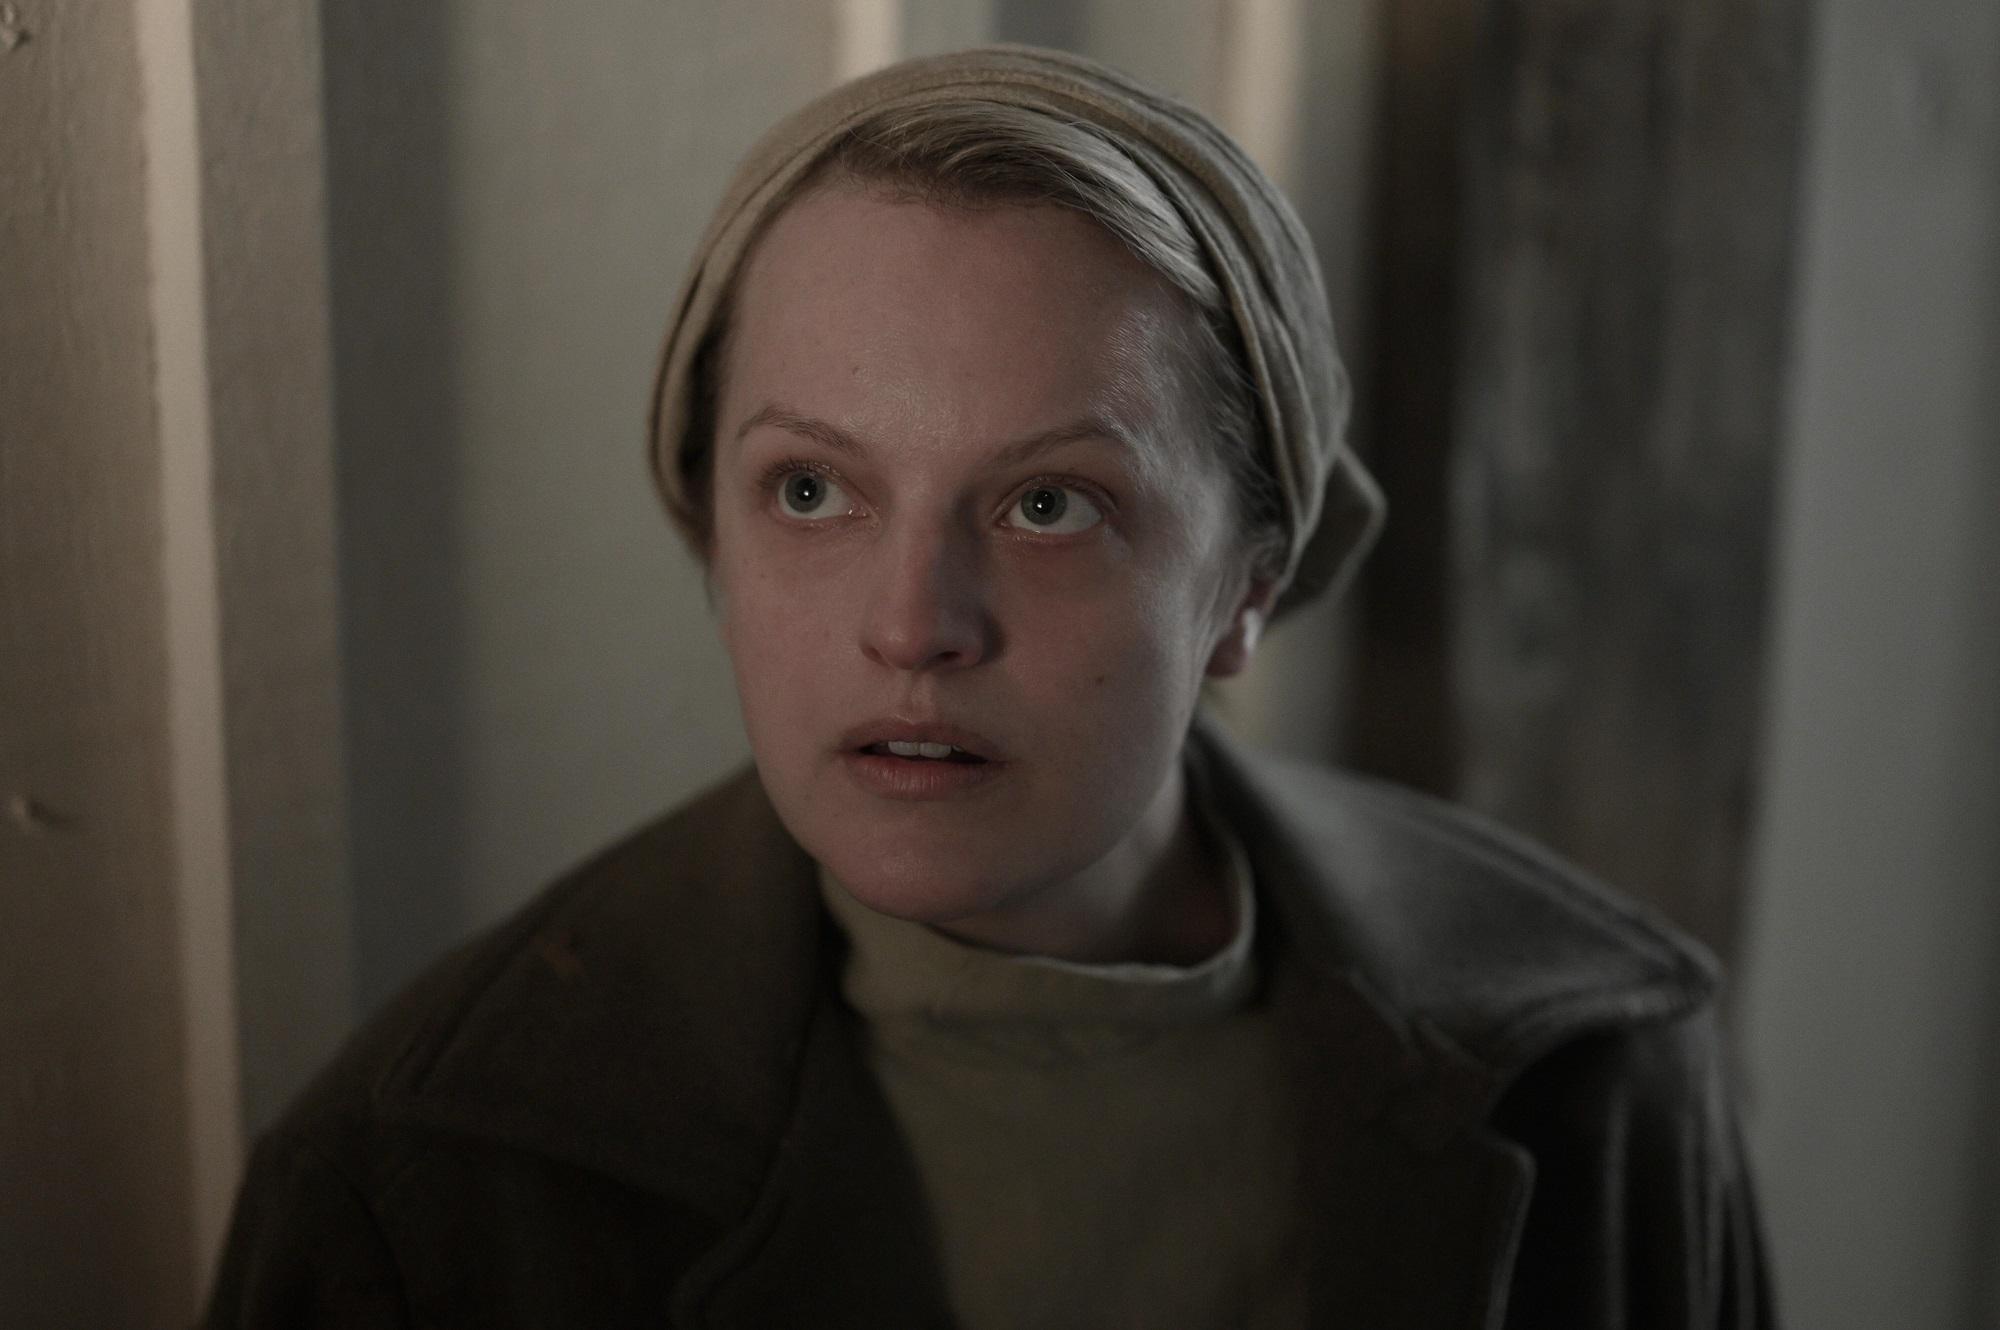 Elisabeth Moss in season 4 episode 2 of 'The Handmaid's Tale'